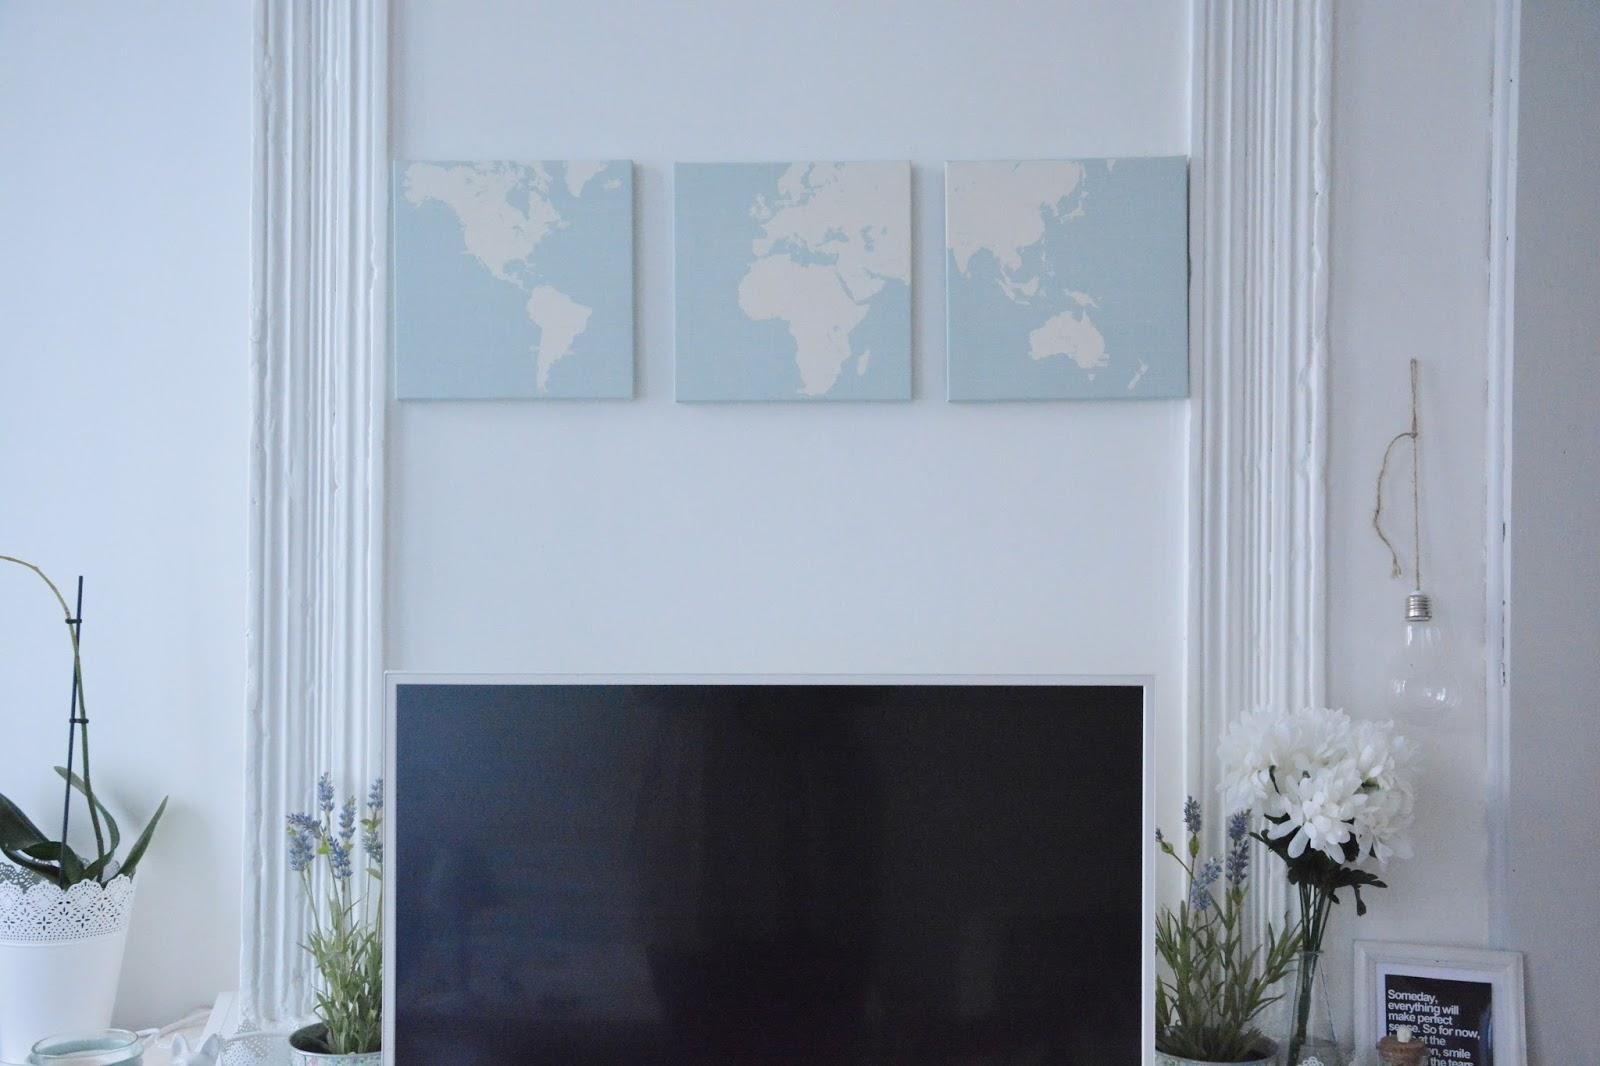 stunning tableaux ikea fausses lavandes ikea fausses fleurs blanches gifi with tableau fleur ikea. Black Bedroom Furniture Sets. Home Design Ideas